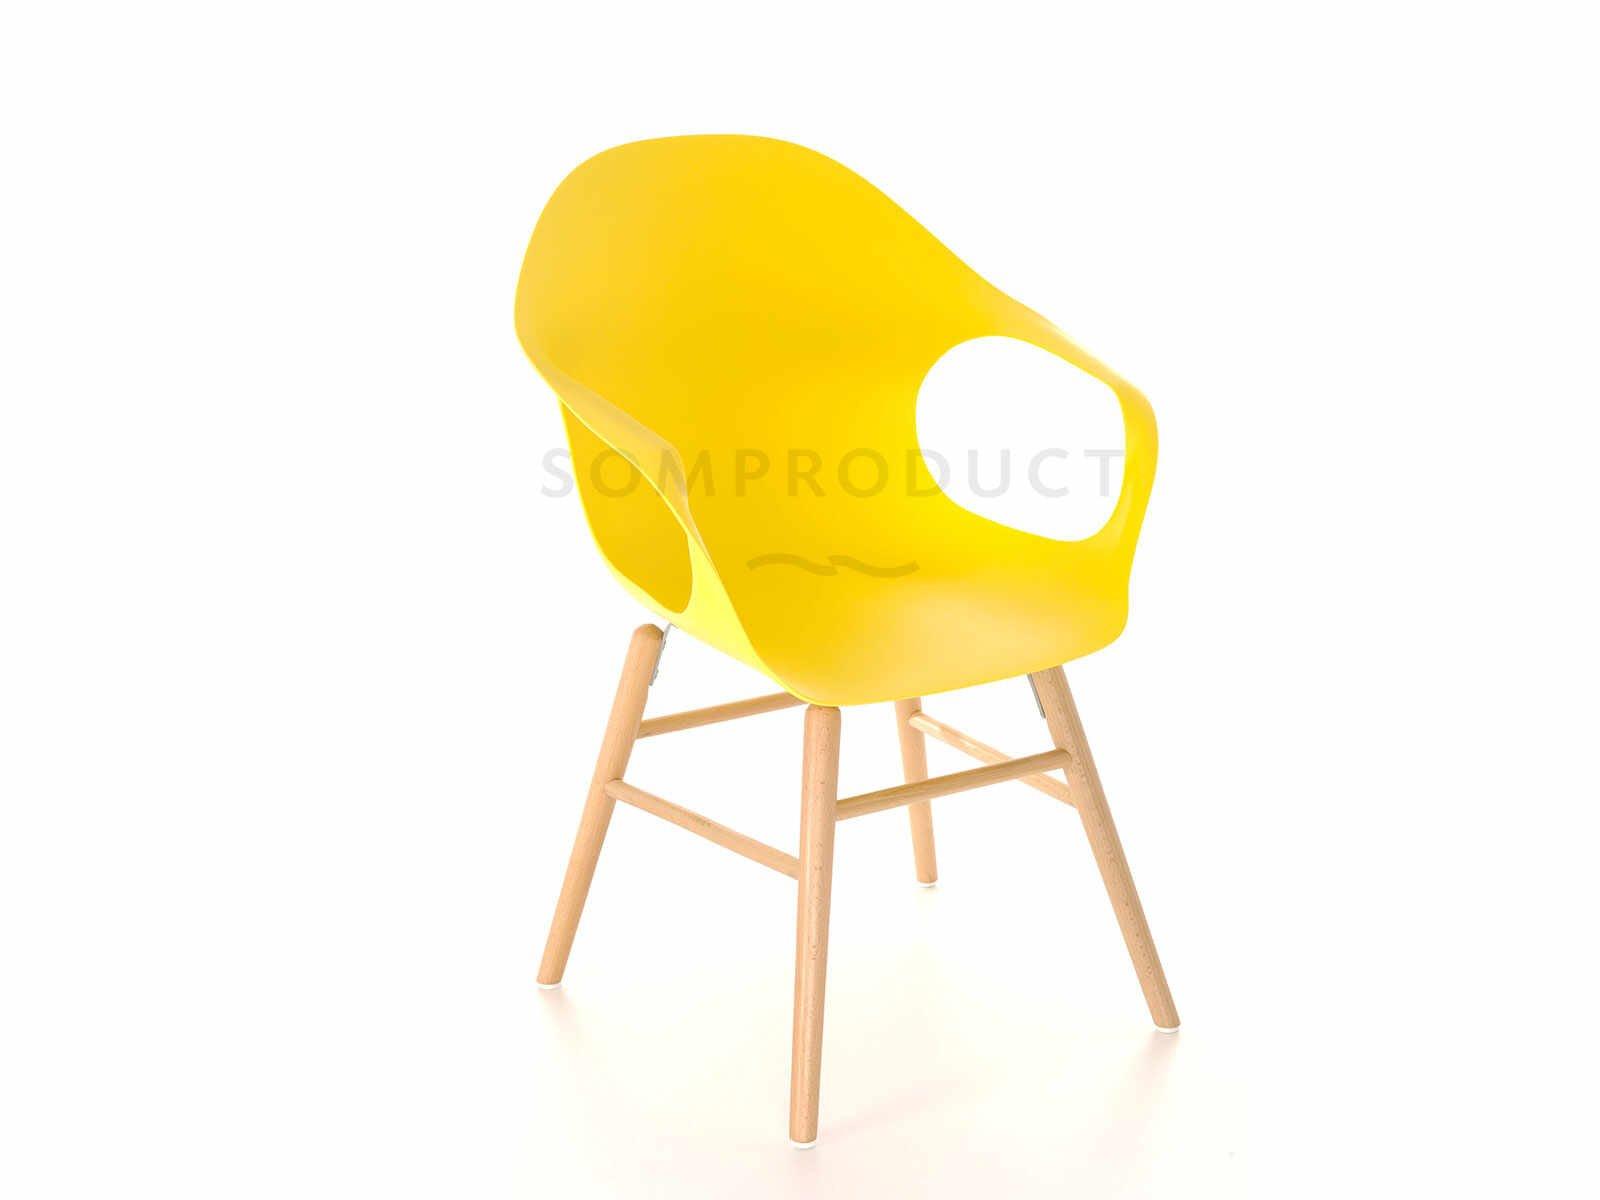 Scaun din plastic cu picioare de lemn Britt Yellow, l58,5xA62,5xH86 cm la pret 259 lei